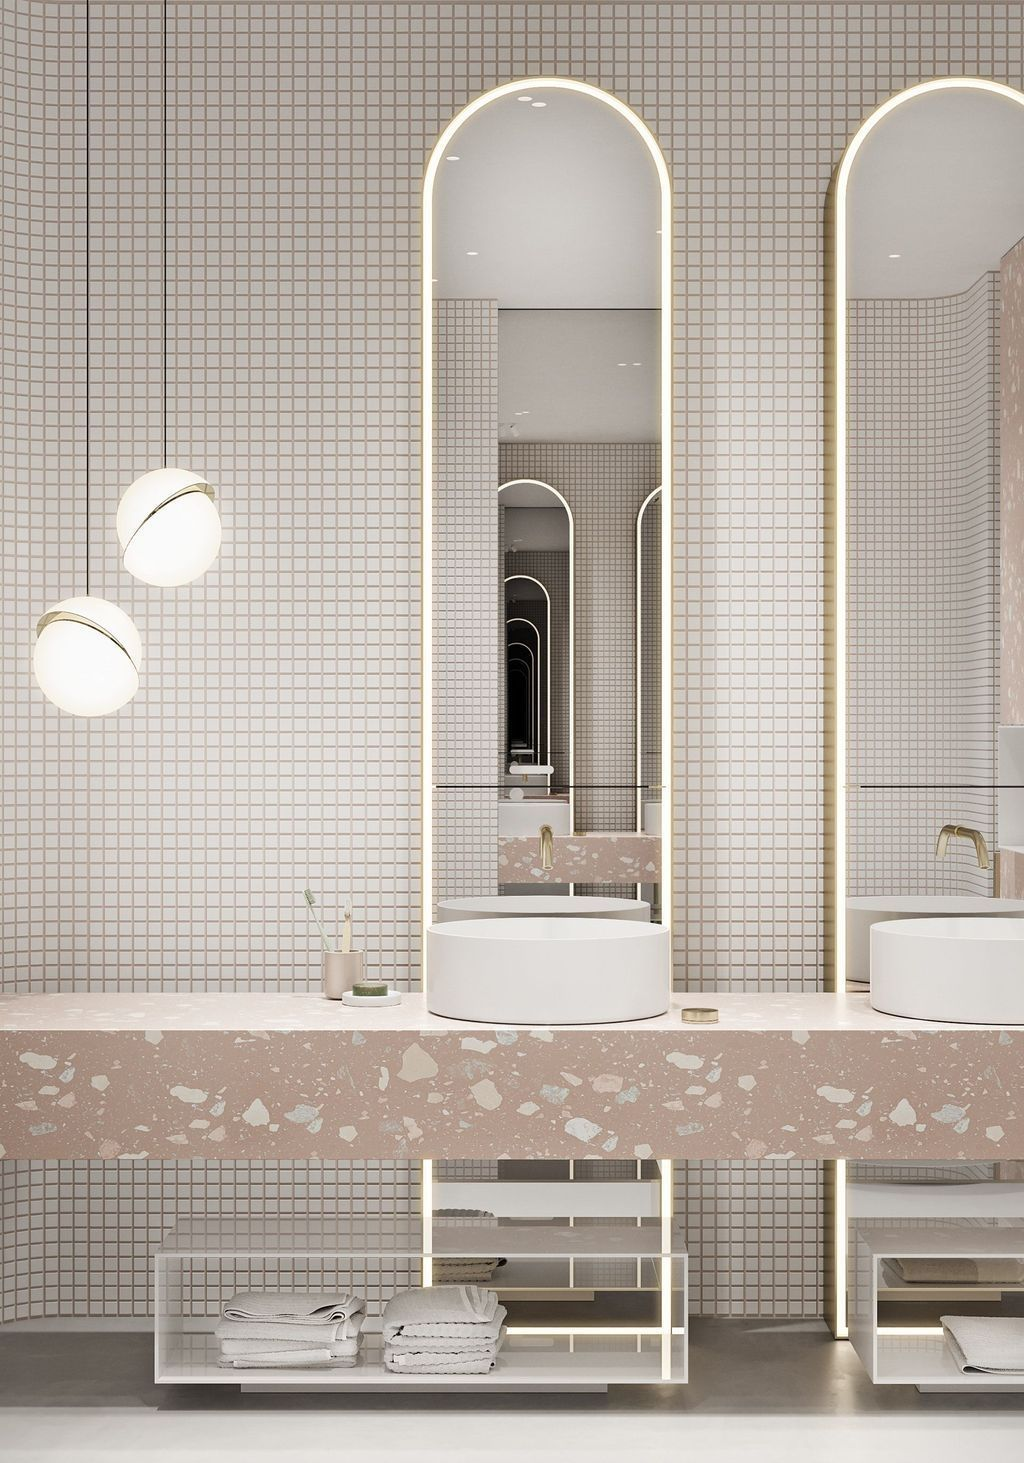 20 Surpirising Apartment Bathroom Renovation Design Ideas To Try Asap In 2020 Badezimmer Innenausstattung Wc Design Bad Inspiration